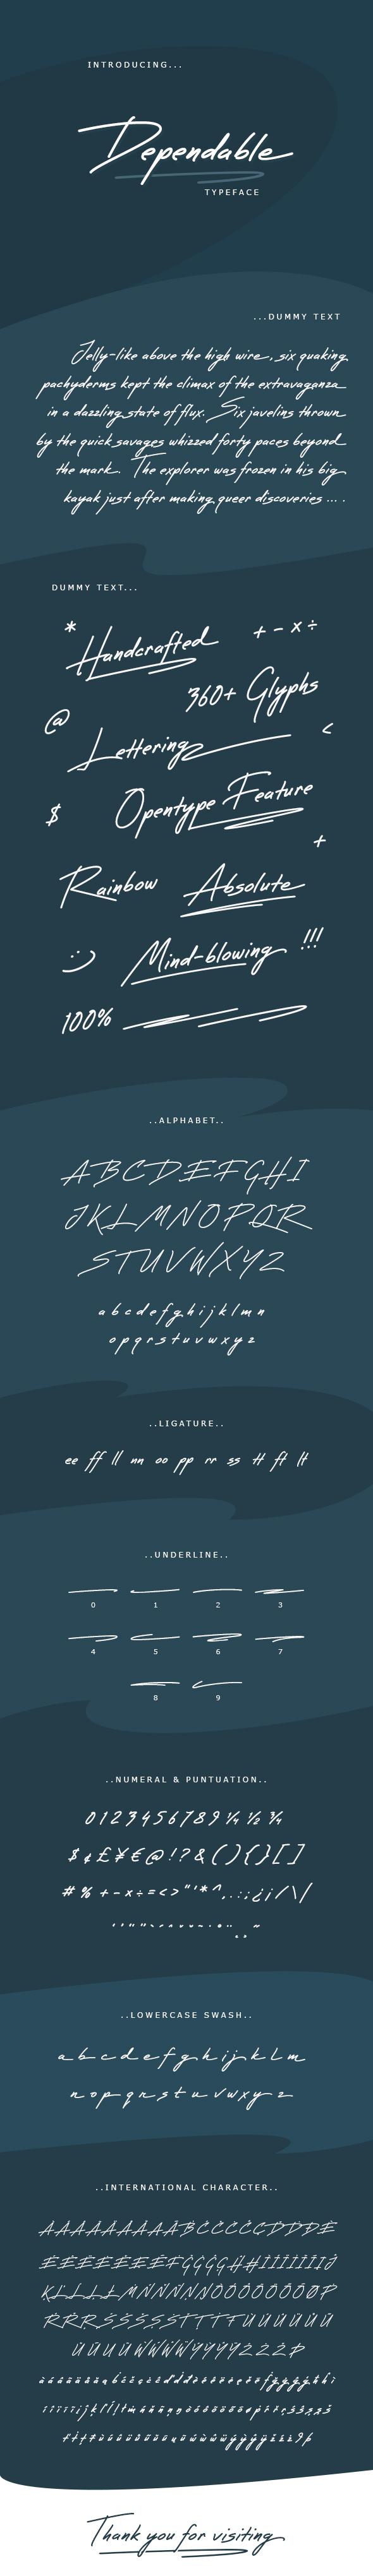 GraphicRiver Dependable Font 20817525